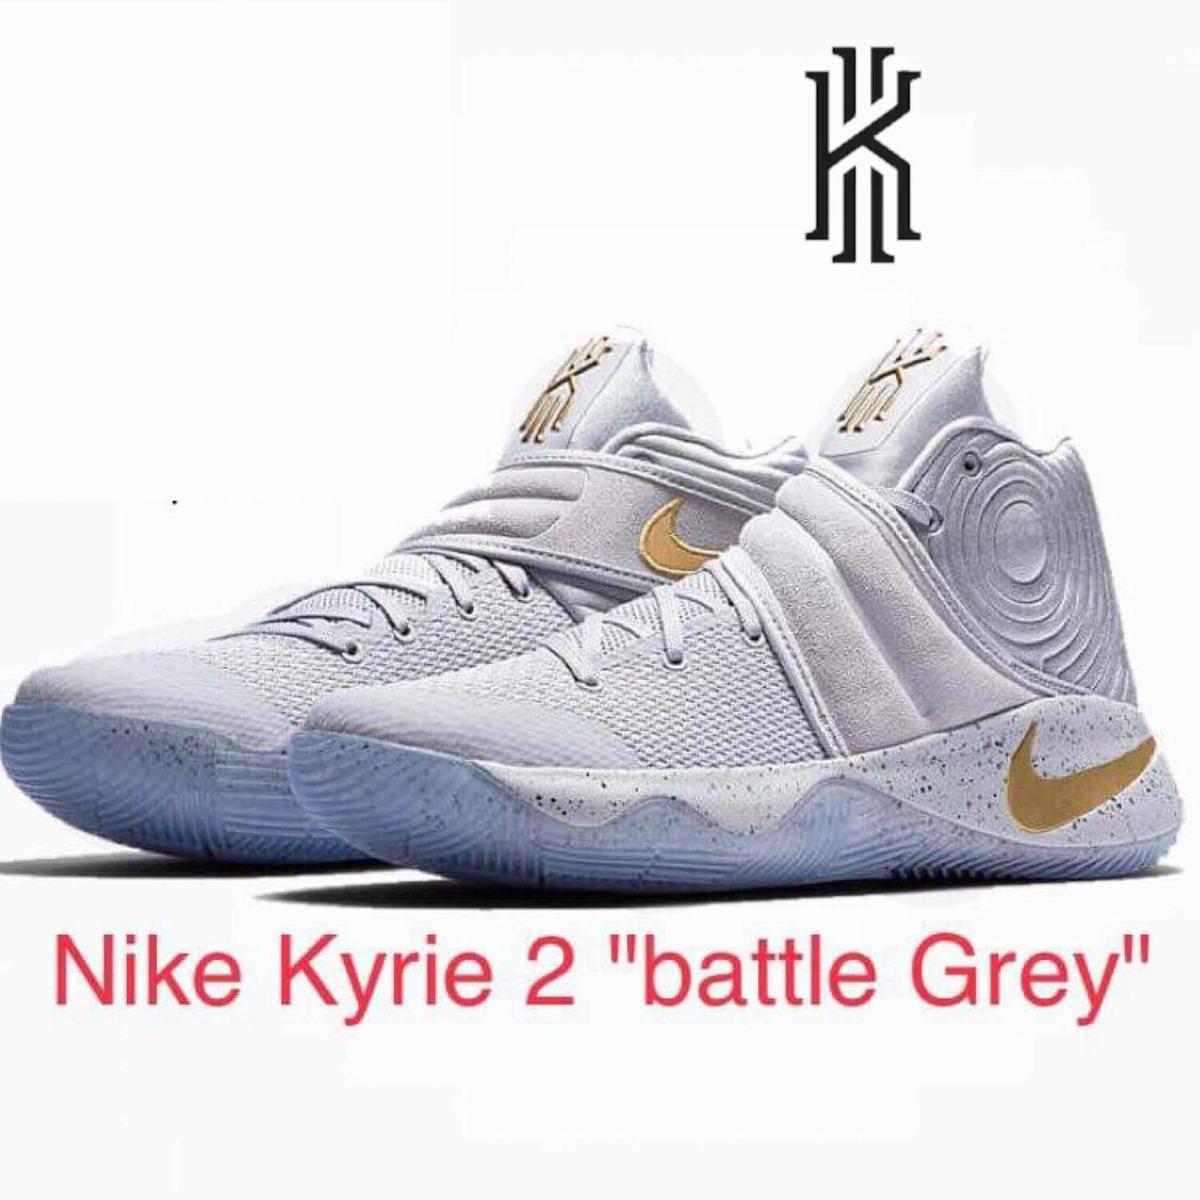 Nike Kyrie 2 battle Grey